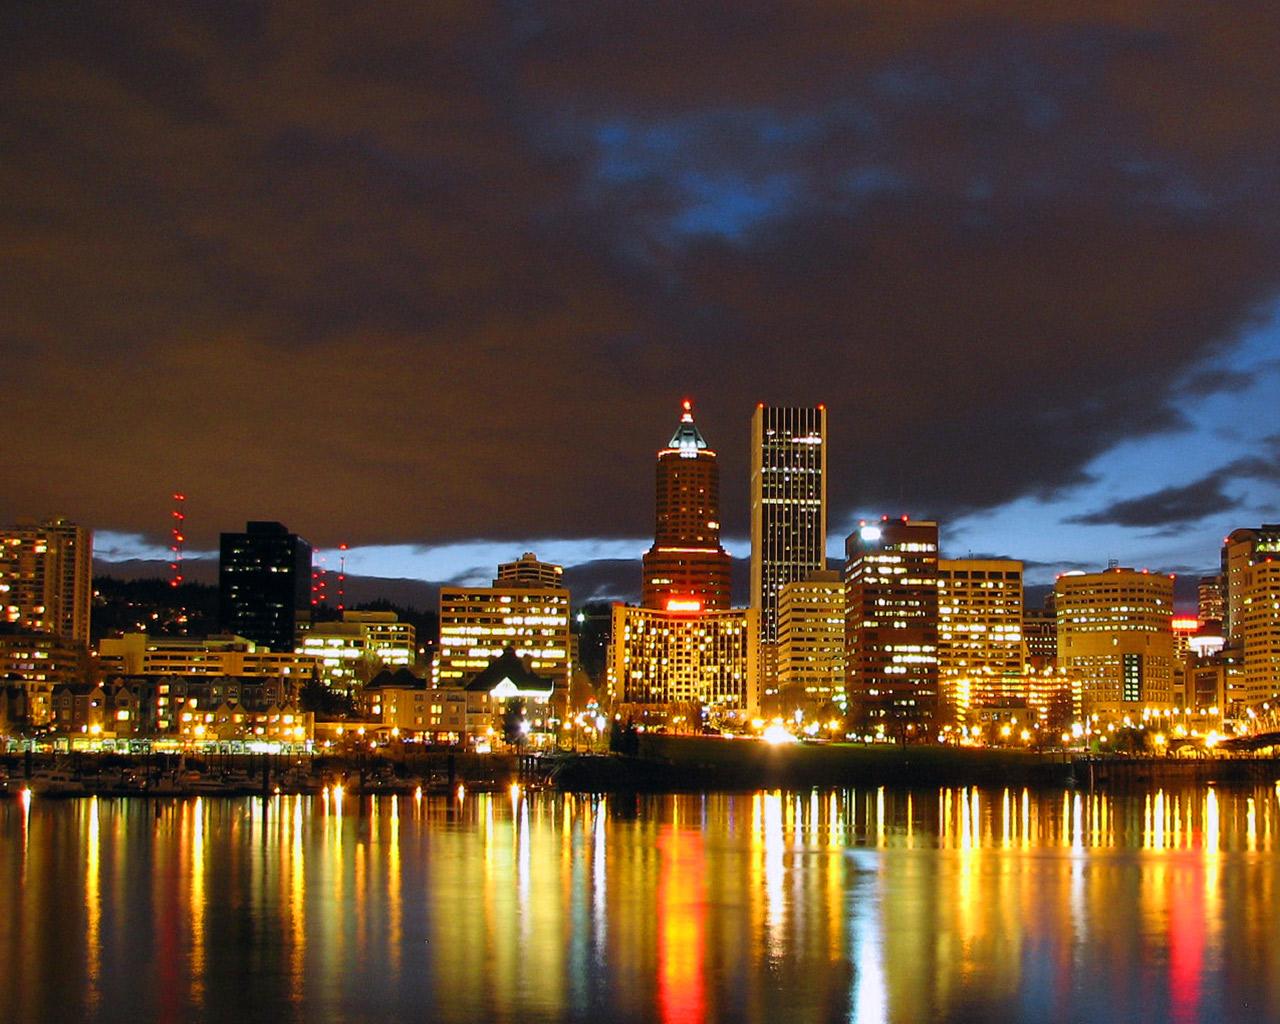 Portland Images Portland Cityscape At Night Hd Wallpaper